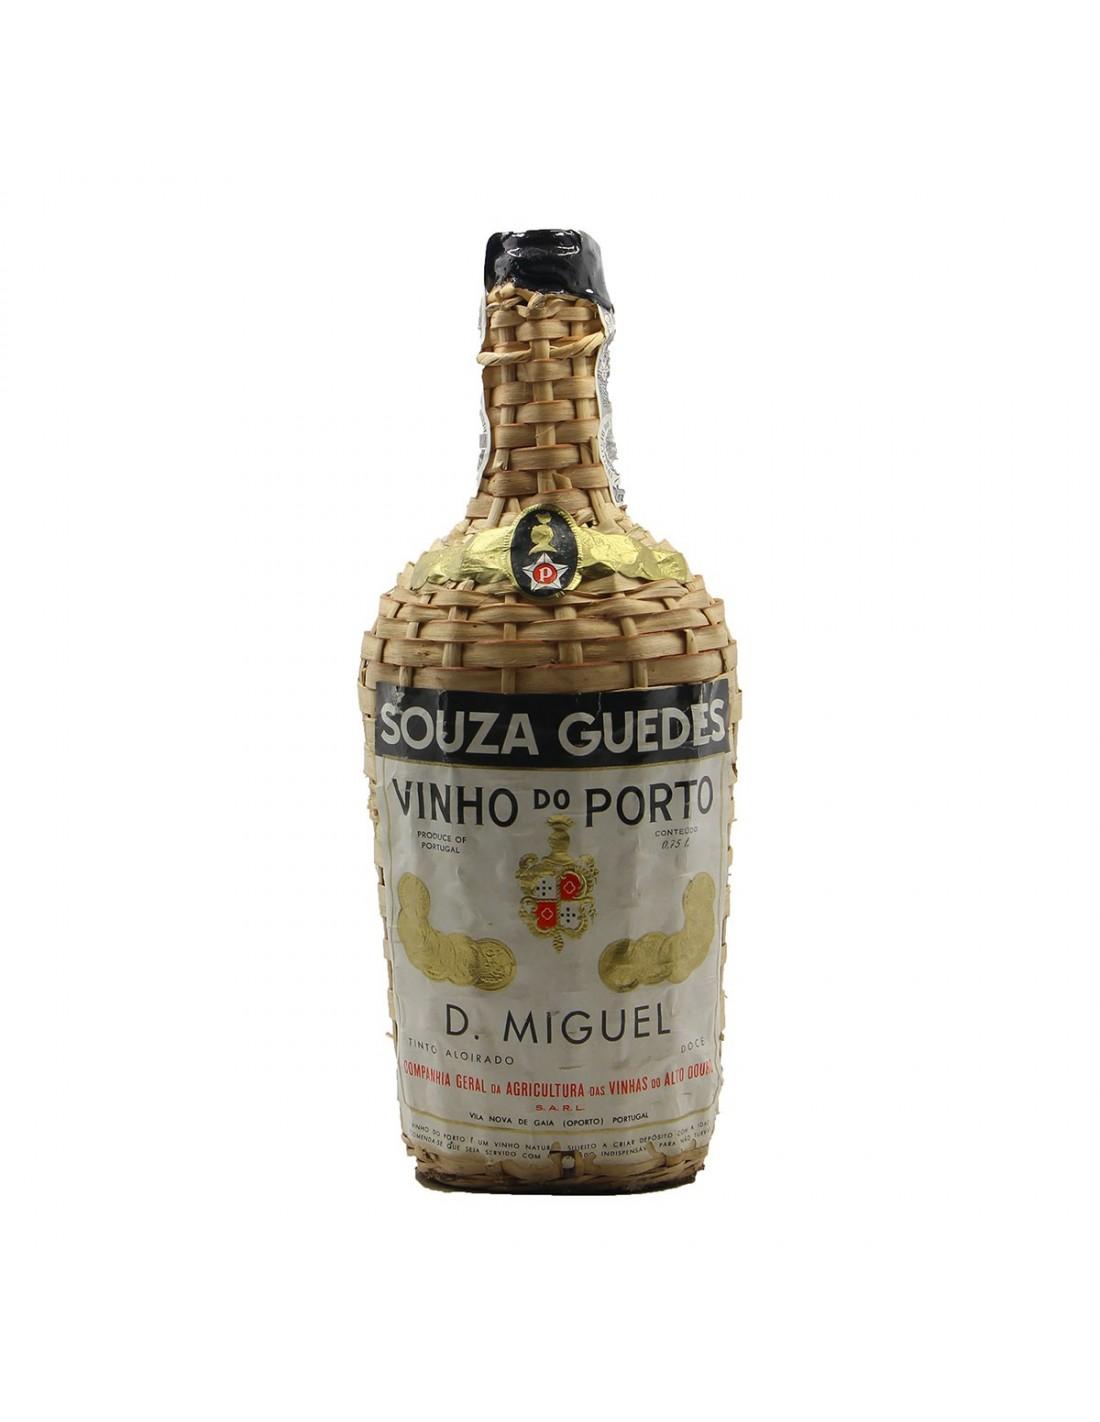 PORTO OLD SOUZA GUEDES NV D.MIGUEL Grandi Bottiglie